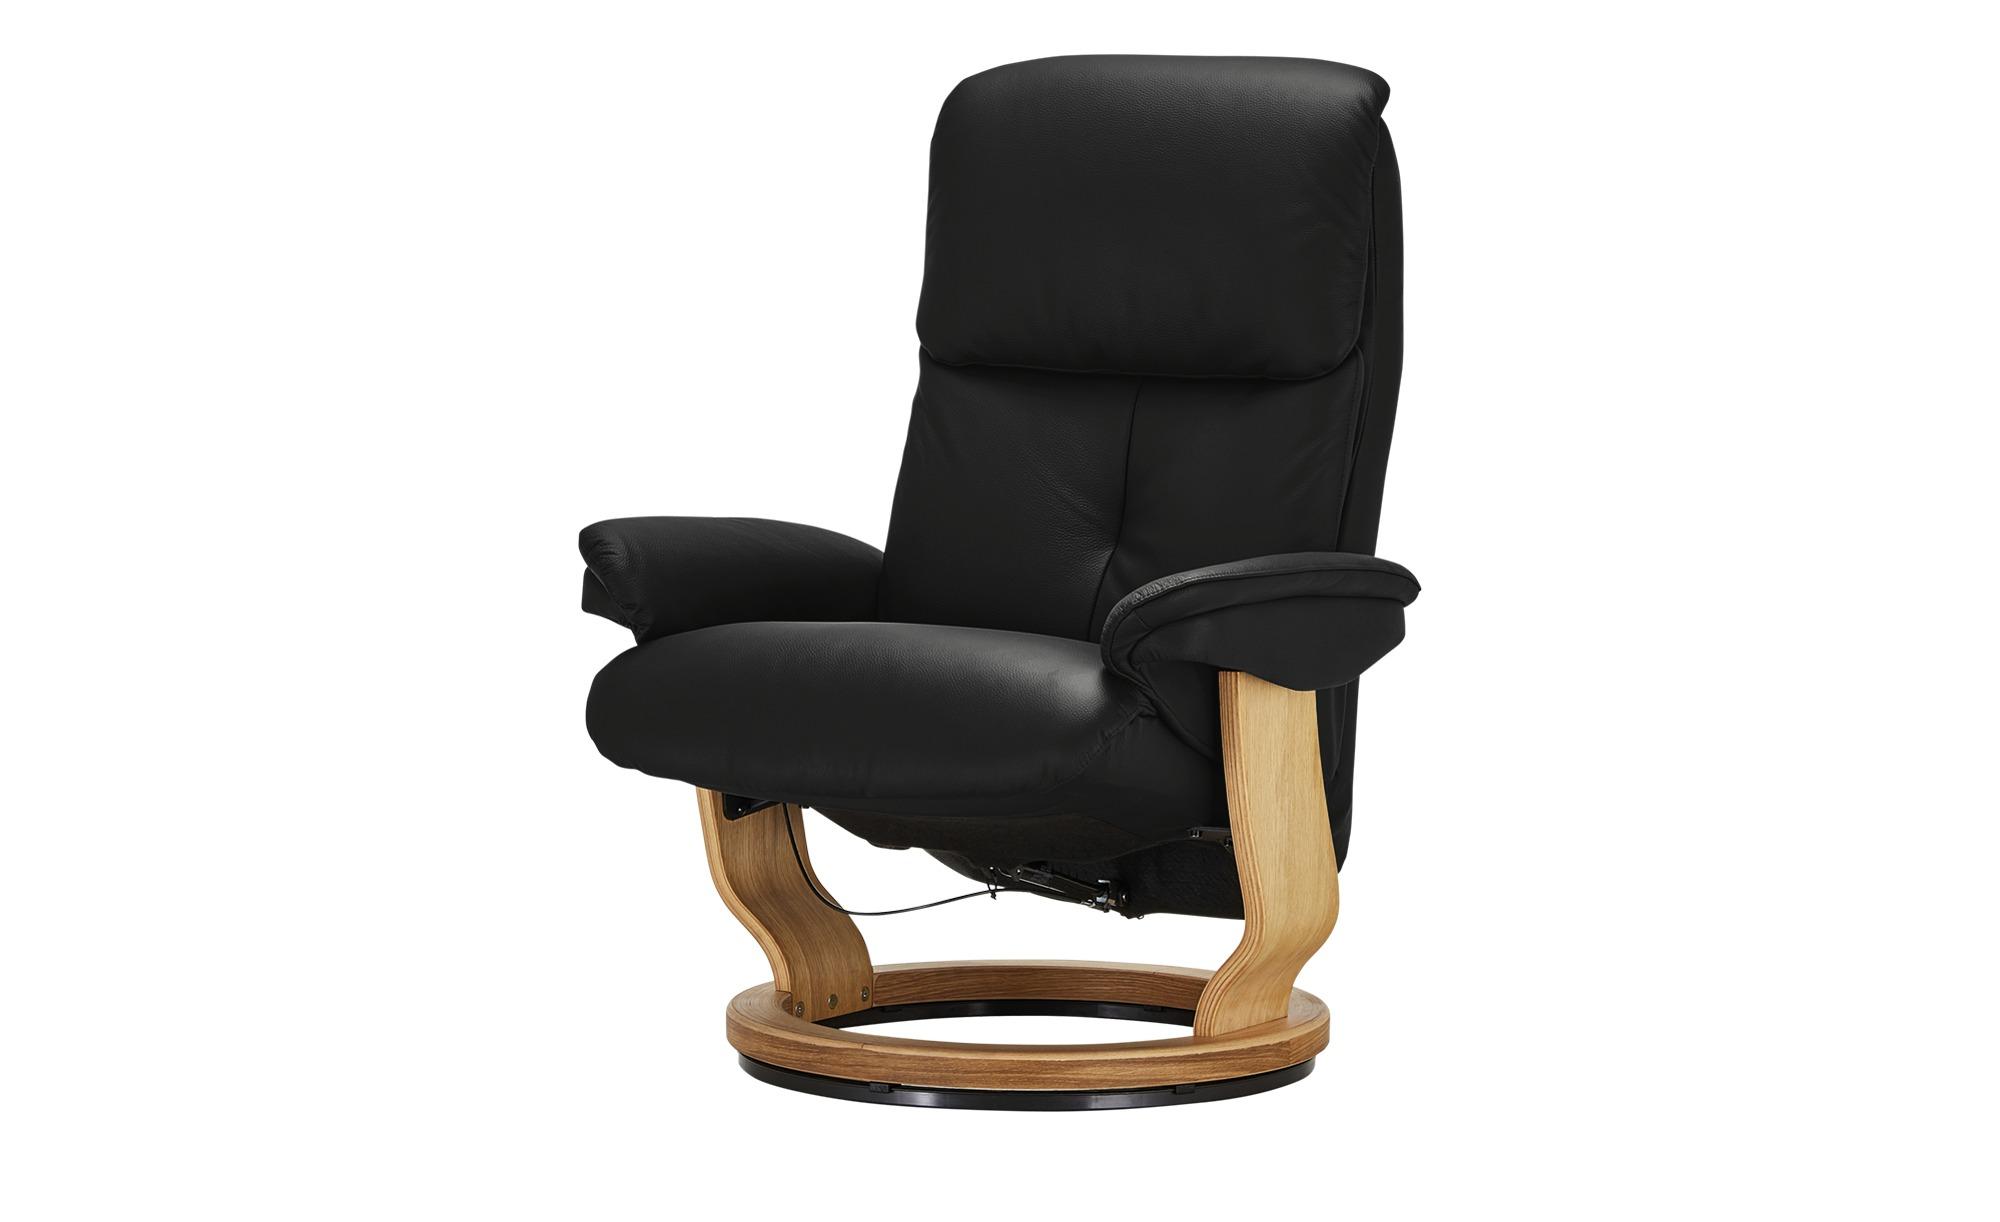 Relaxsessel  Farso ¦ grau ¦ Maße (cm): B: 85 H: 114 T: 92 Polstermöbel > Sessel > Ledersessel - Höffner